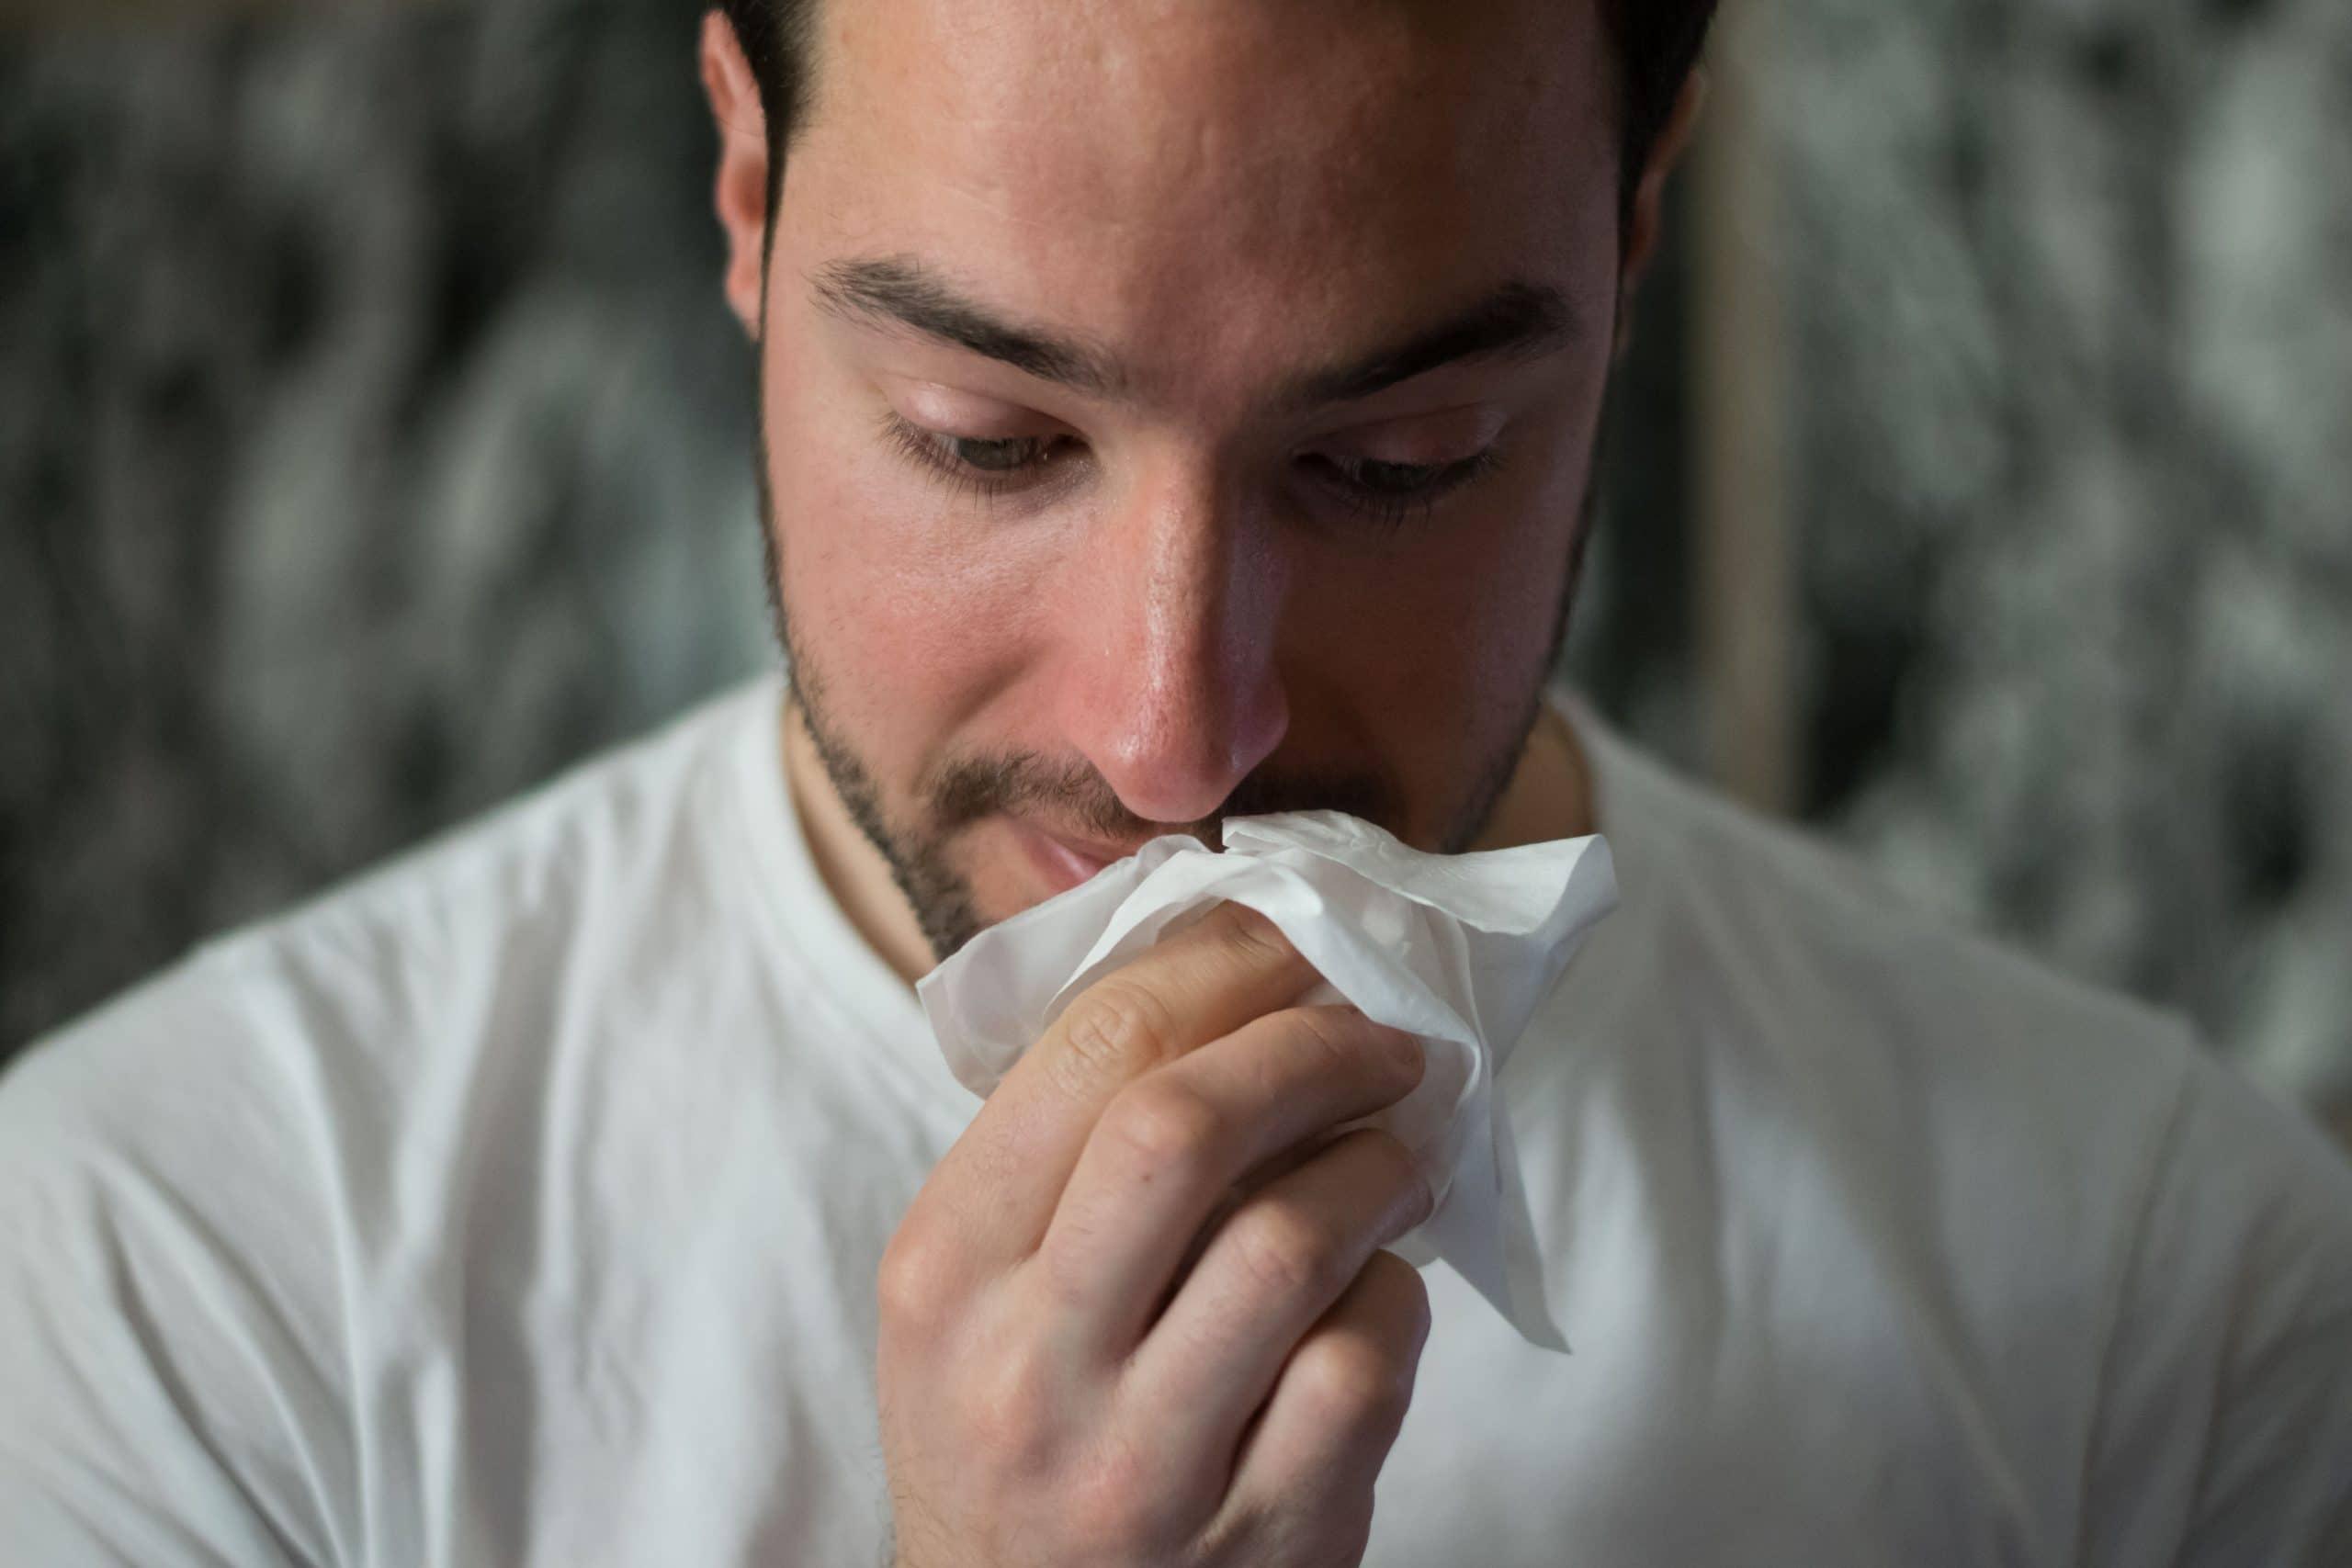 Tomber malade